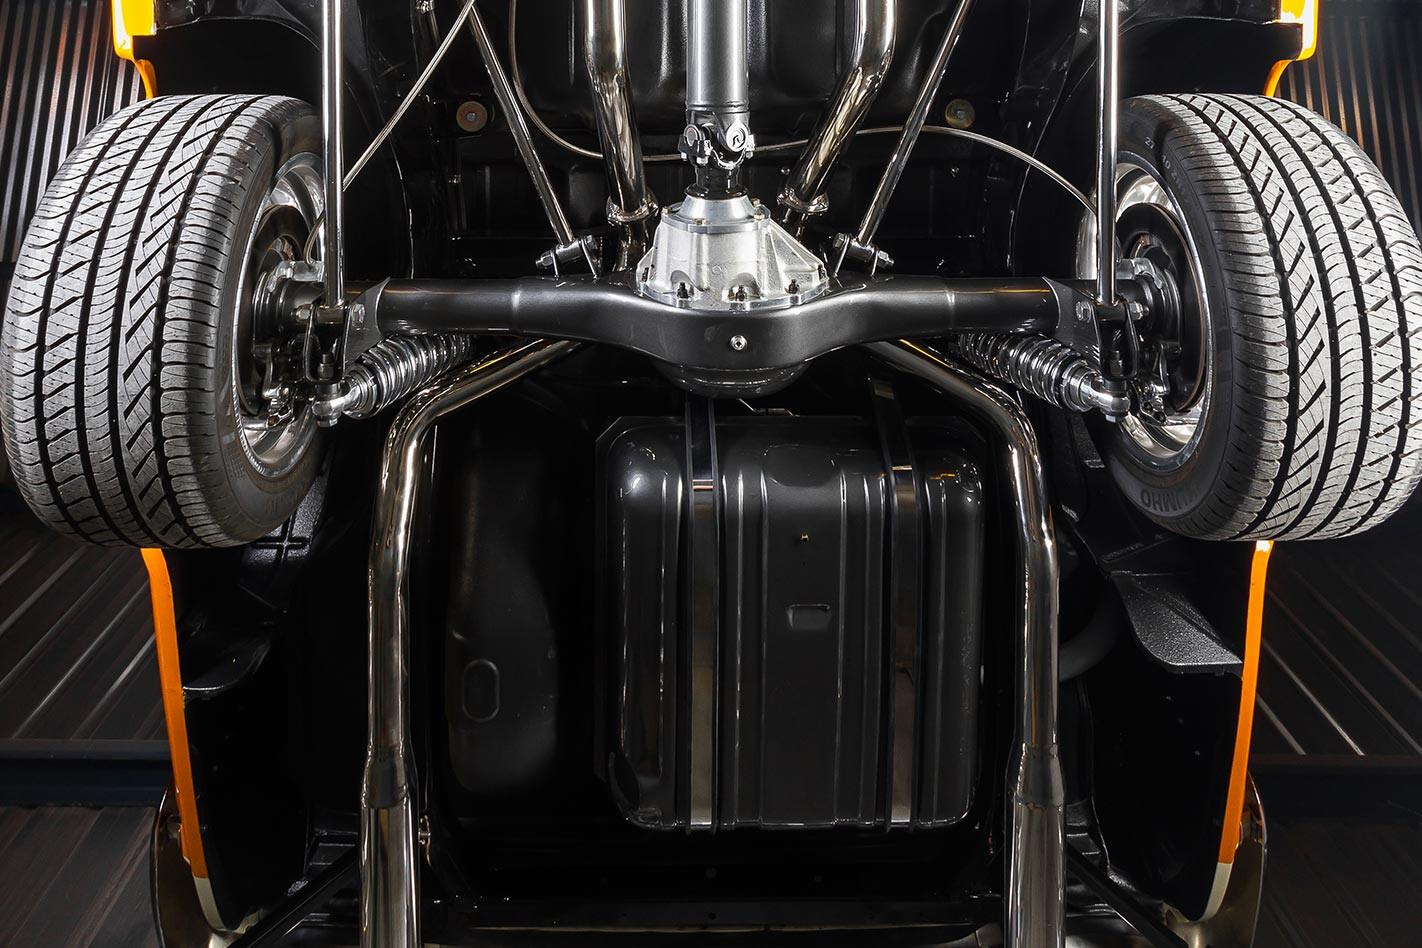 Chev Bel Air fuel tank